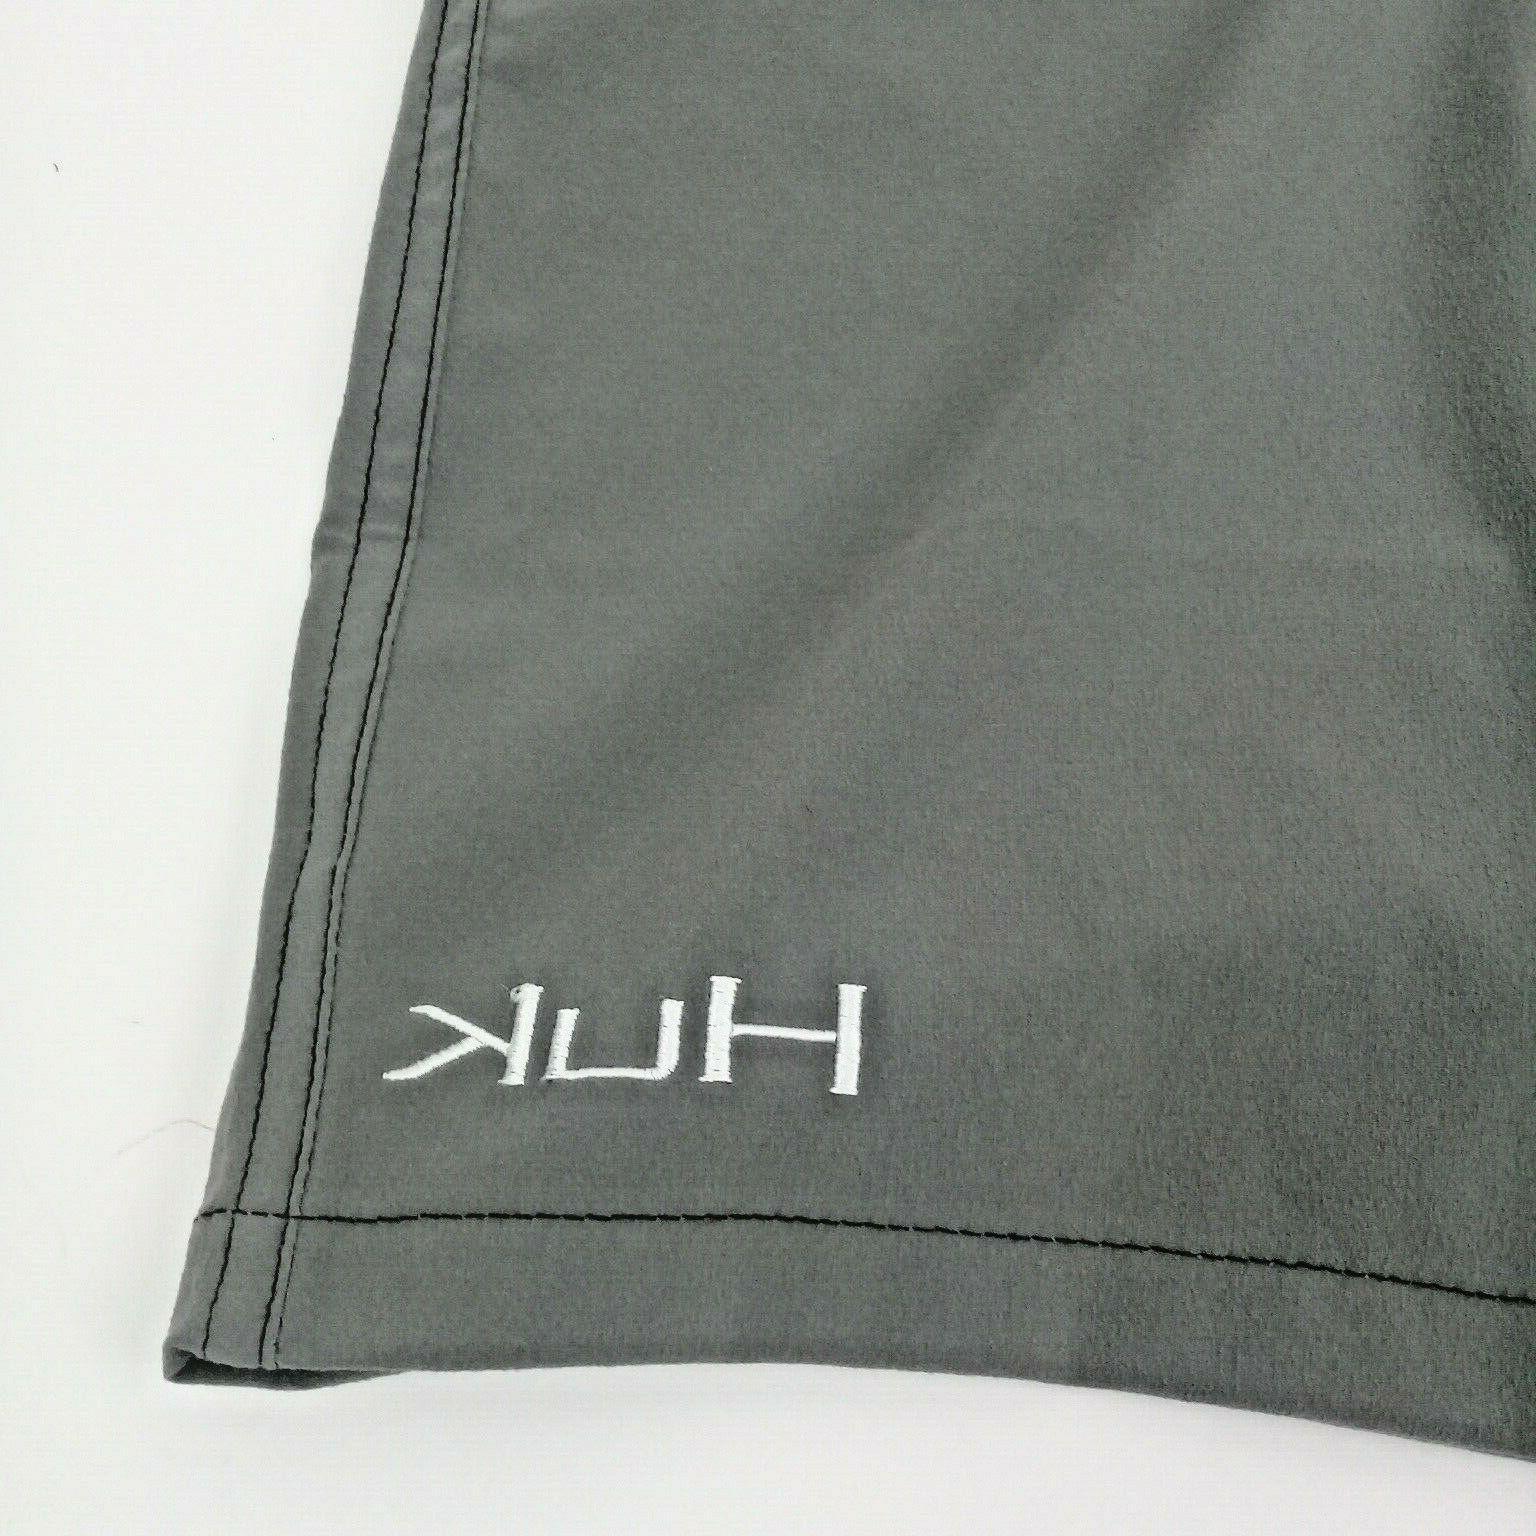 NWT Performance Elements Swim Size Olive